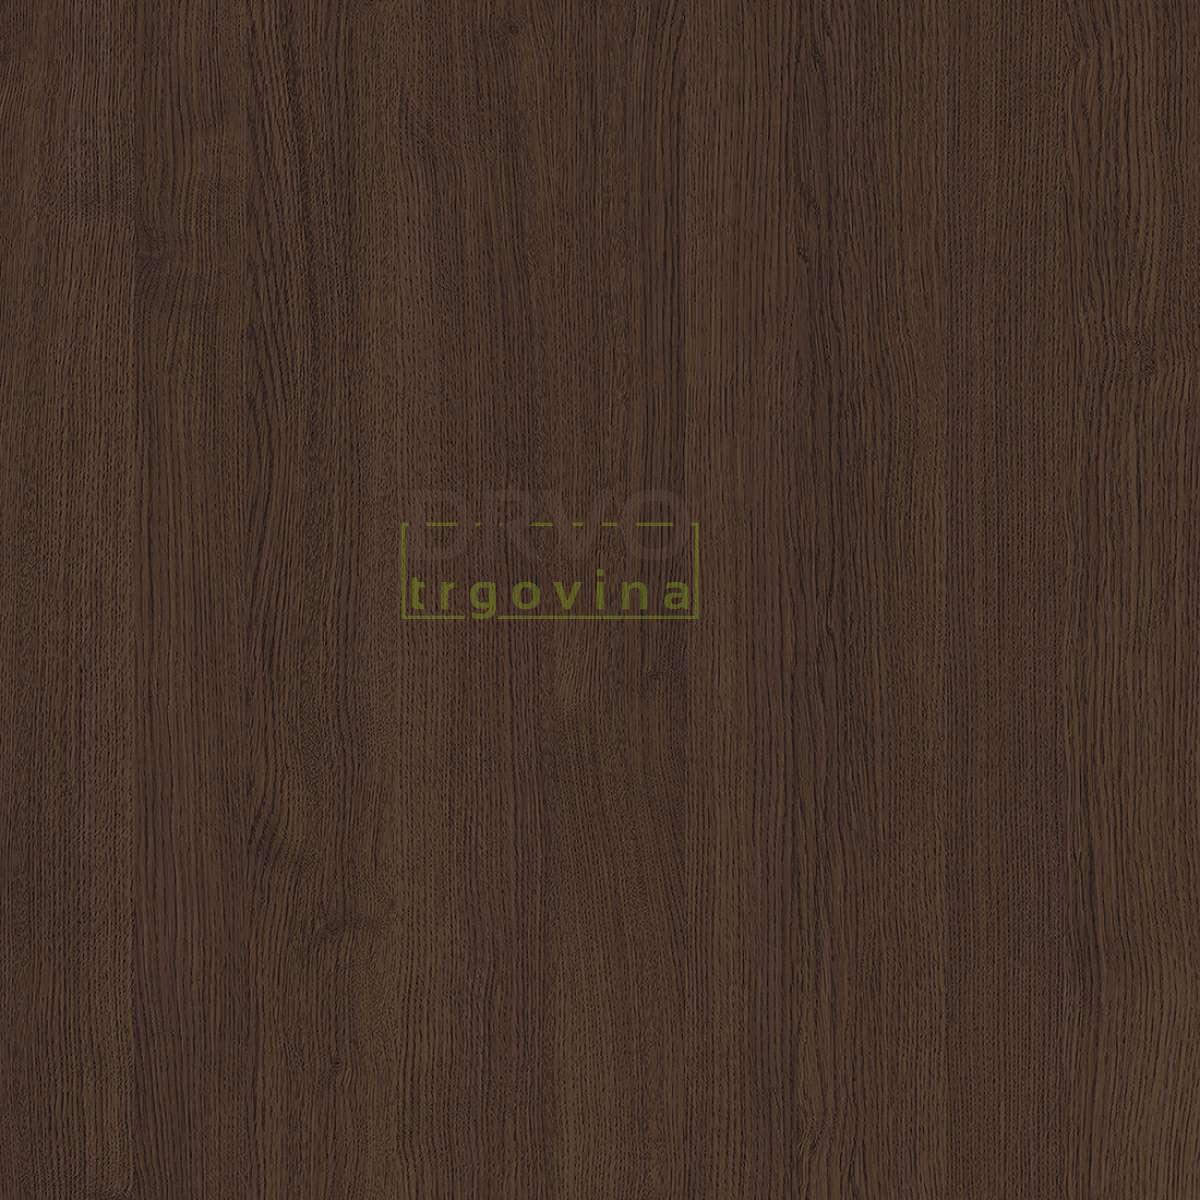 LESONIT VRATNI WENGE 2050/1830/3mm 9182